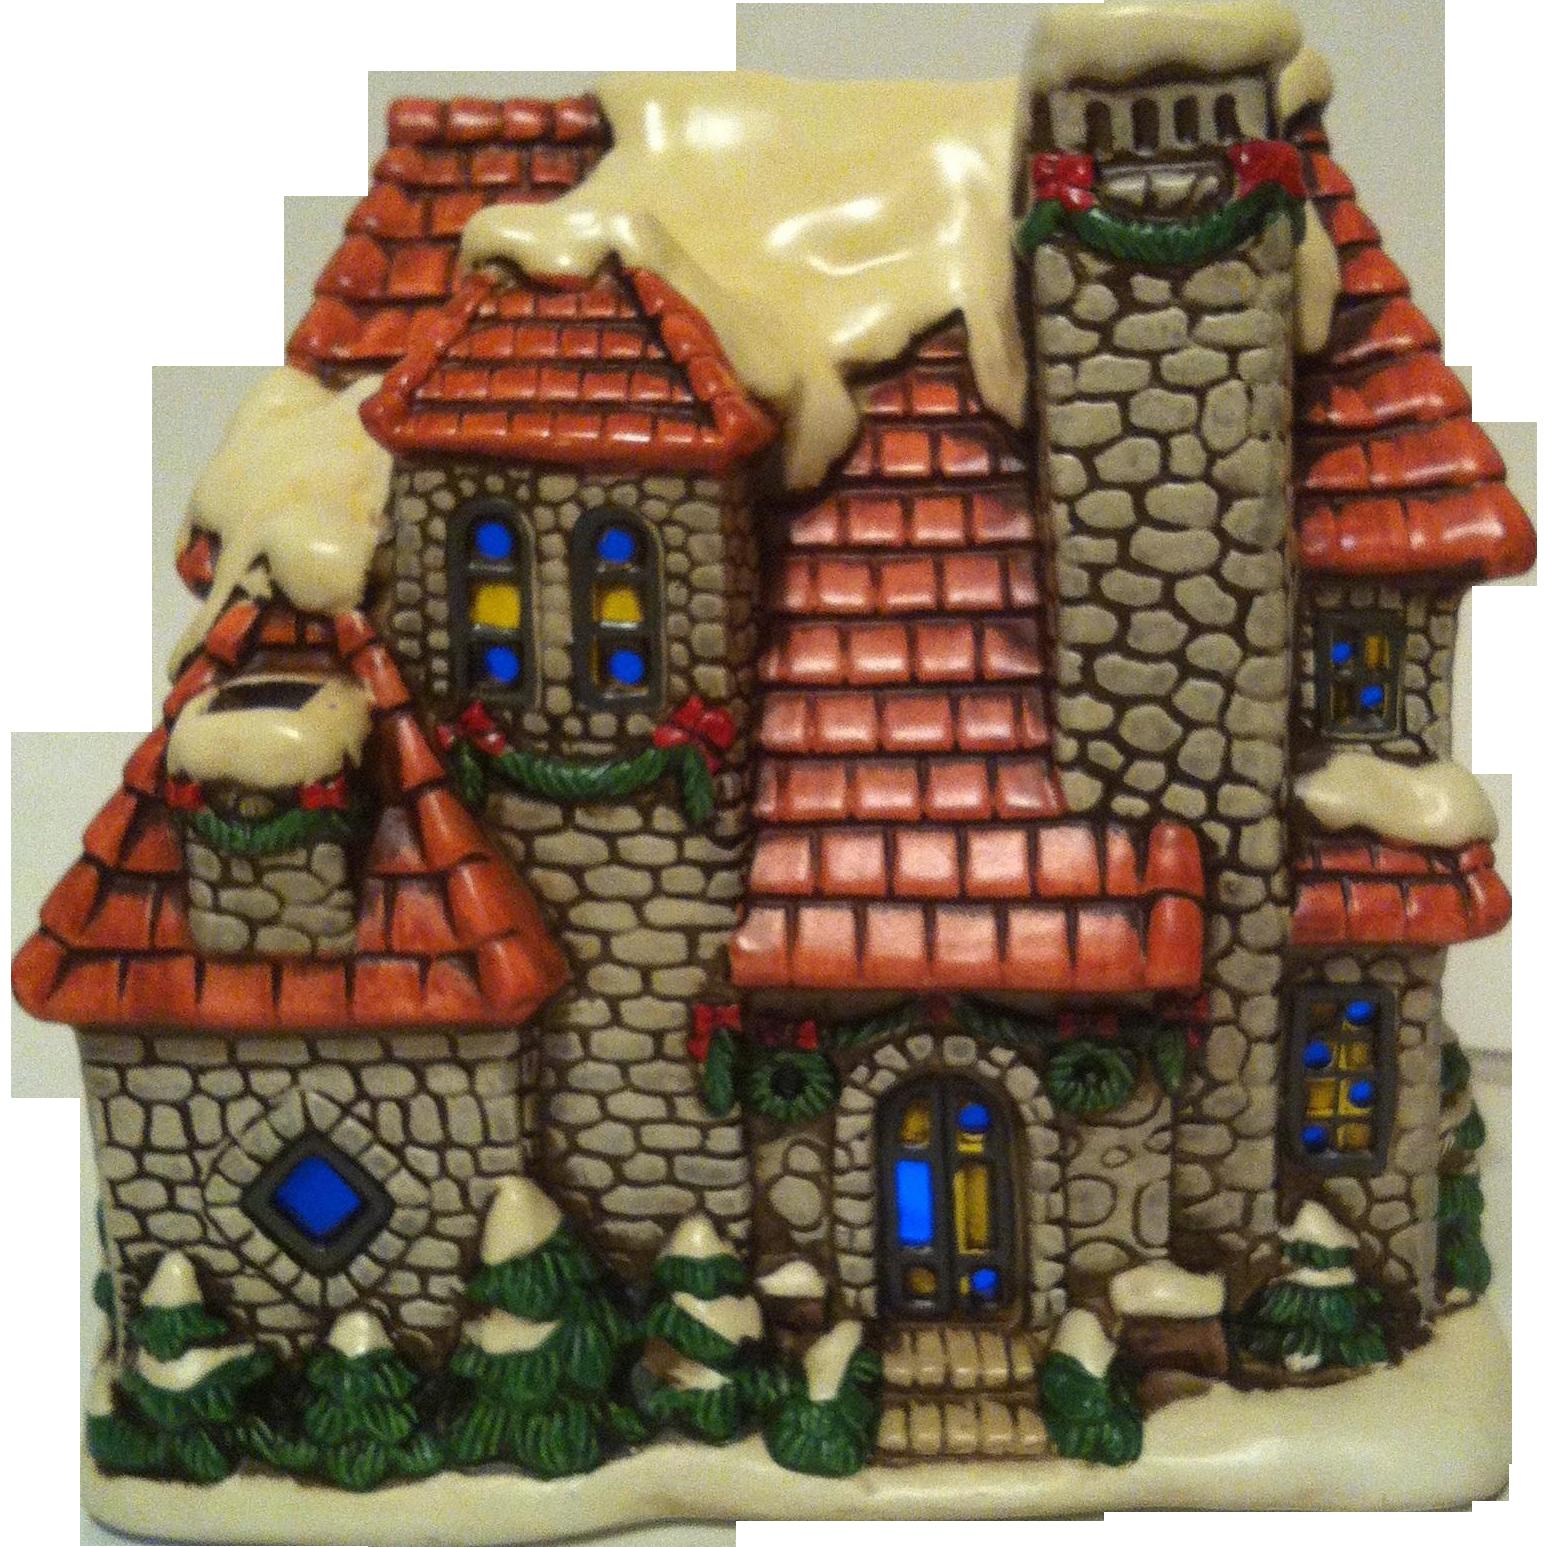 1987 Lefton Stone House ~ Colonial Village # 06338